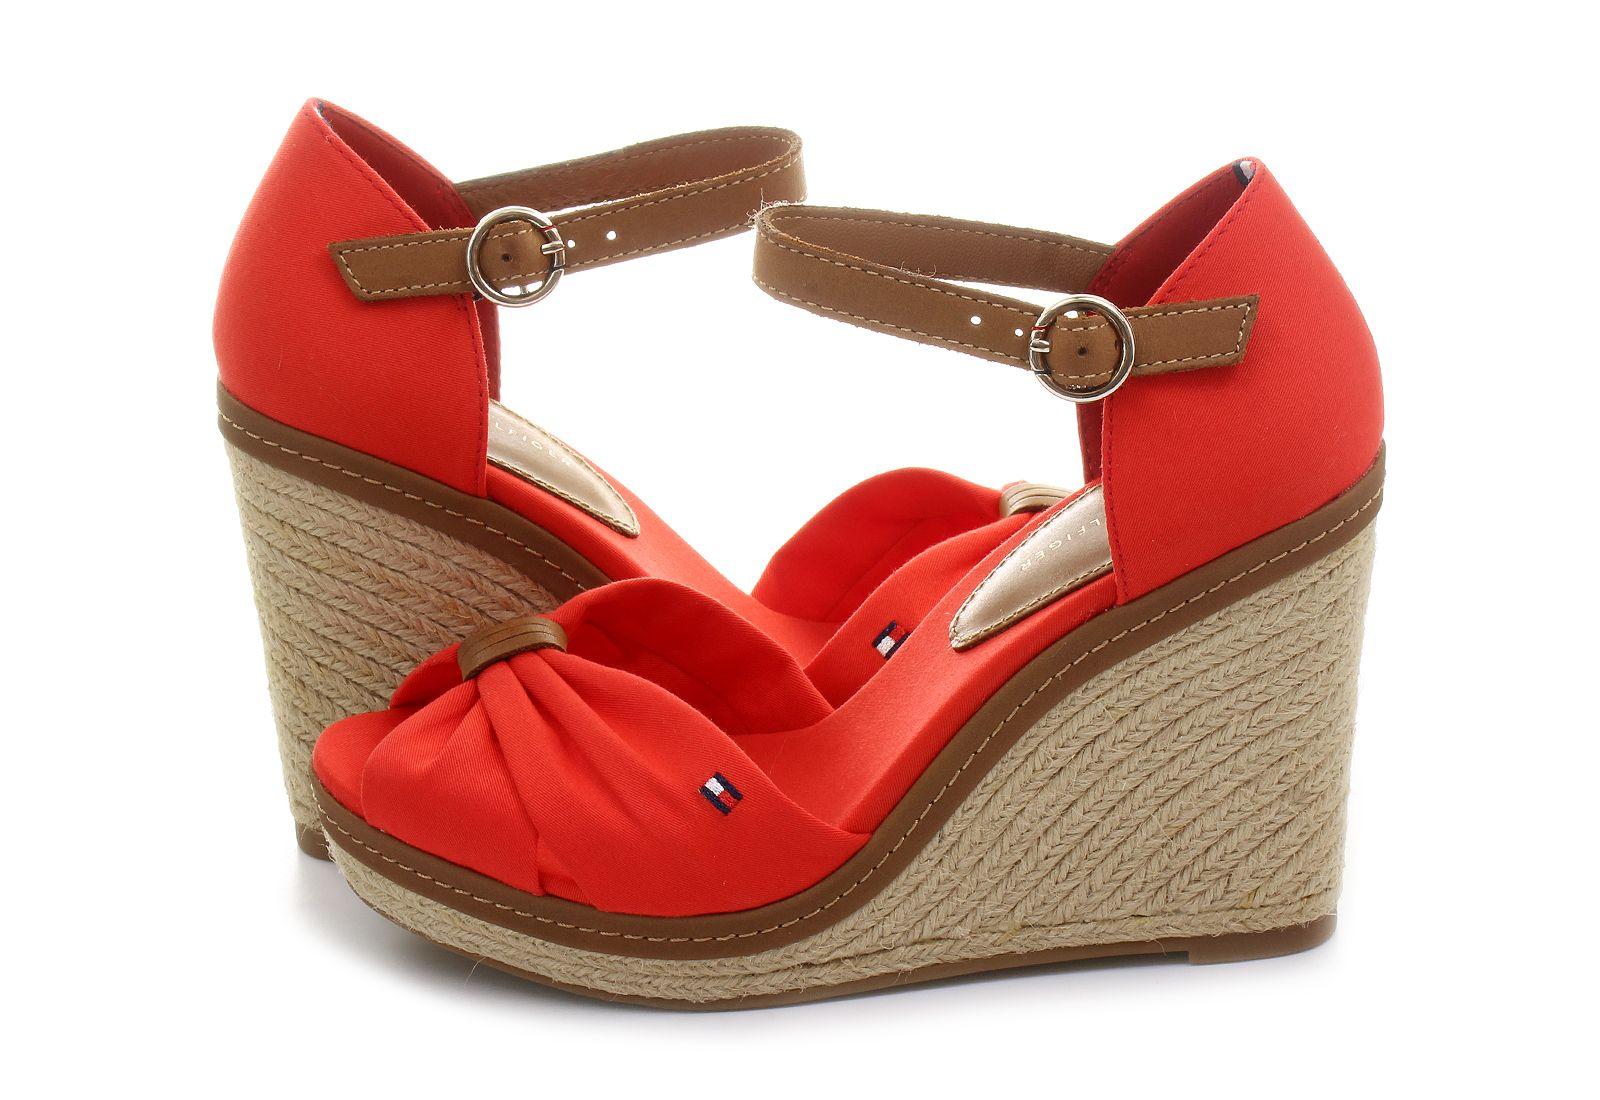 43f6cc18011 Tommy Hilfiger Sandale - Elena 56d - 17S-0905-617 - Office Shoes ...